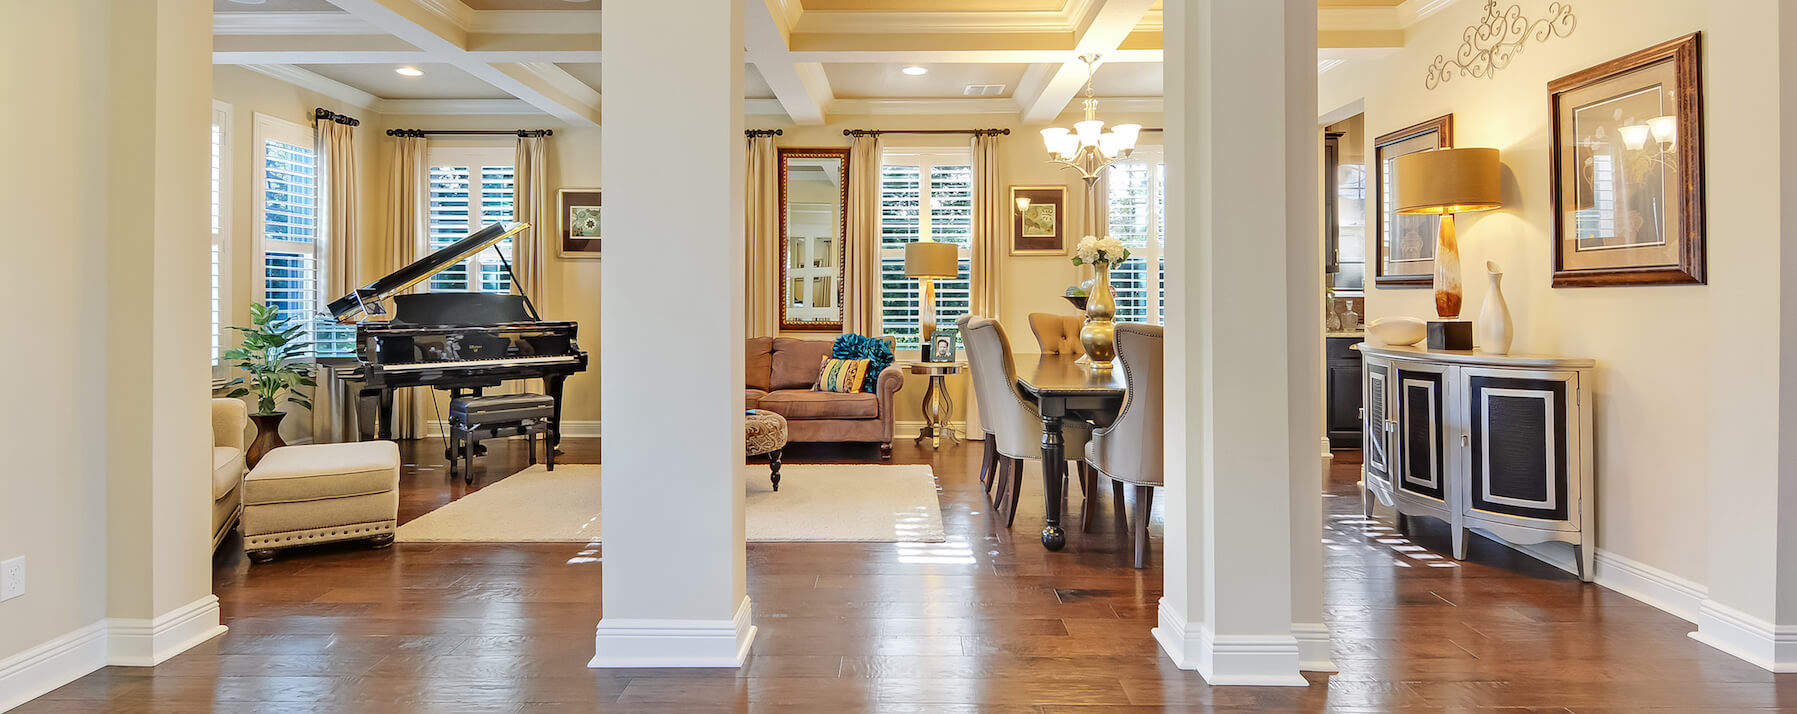 HomeTalk ERA Grizzard Real Estate in Central Florida.jpg